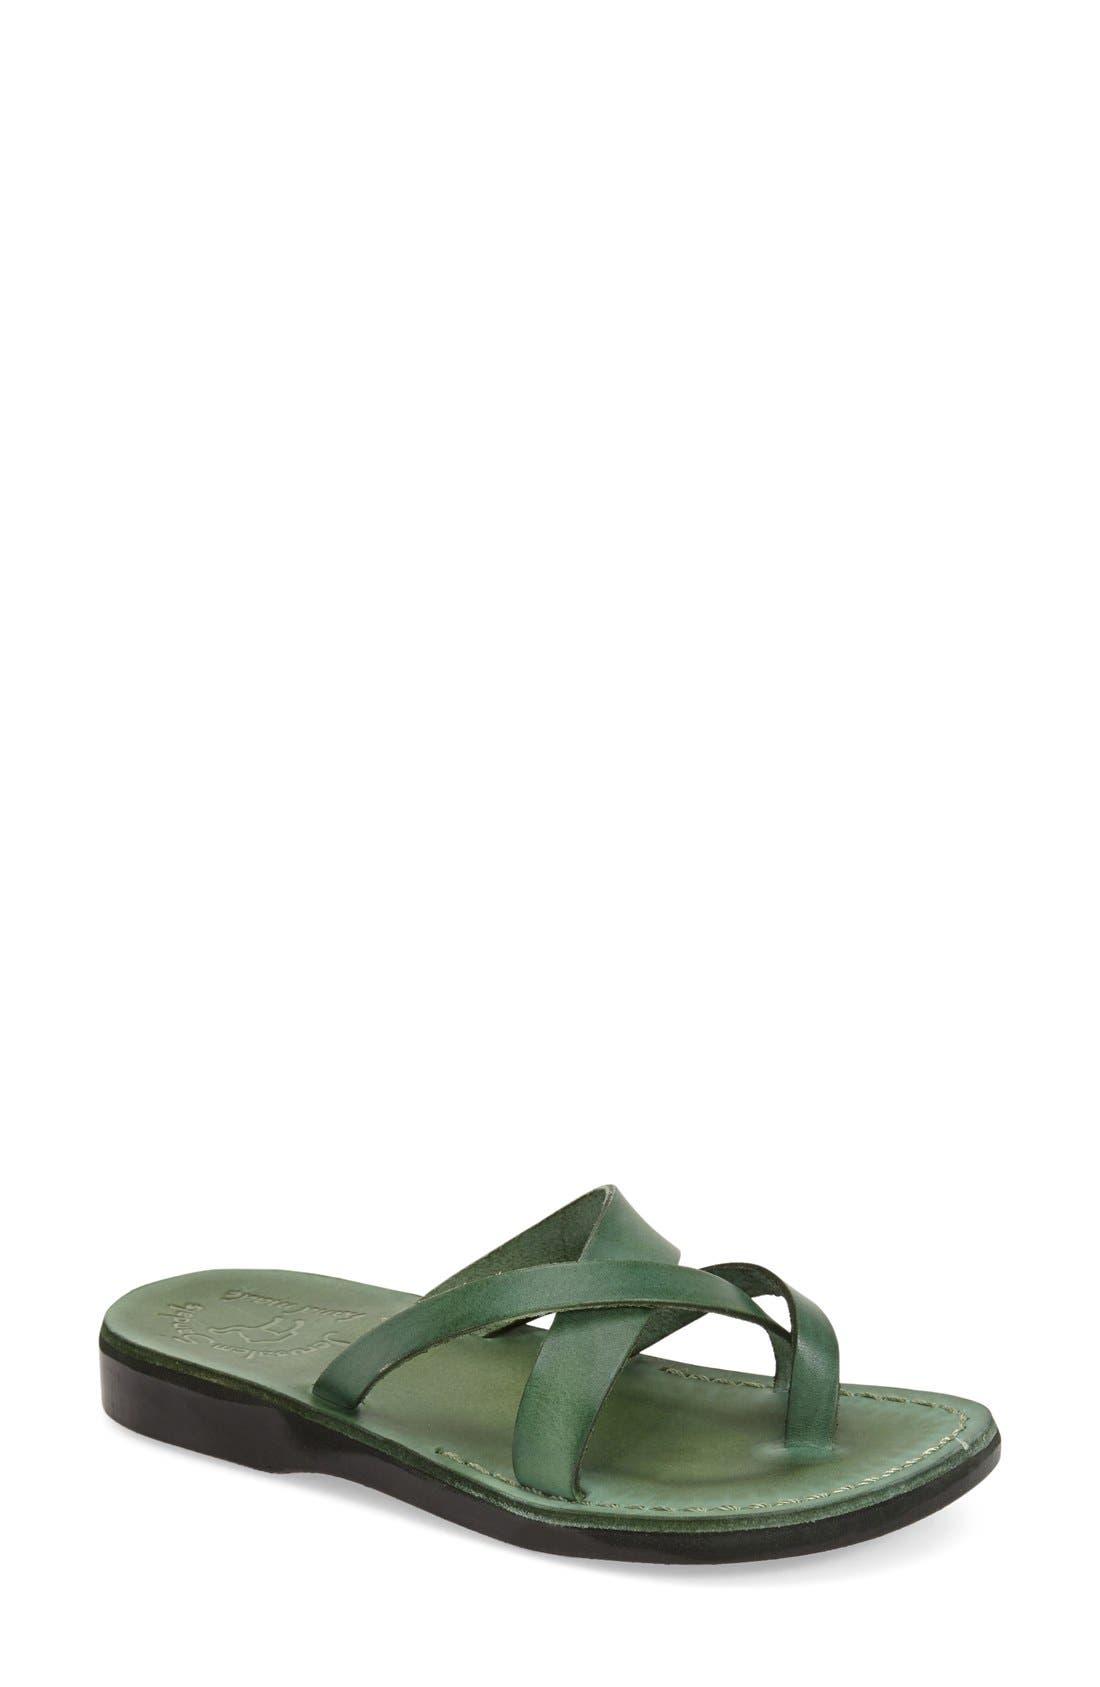 'Abigail' Strappy Slide Sandal,                         Main,                         color, 300